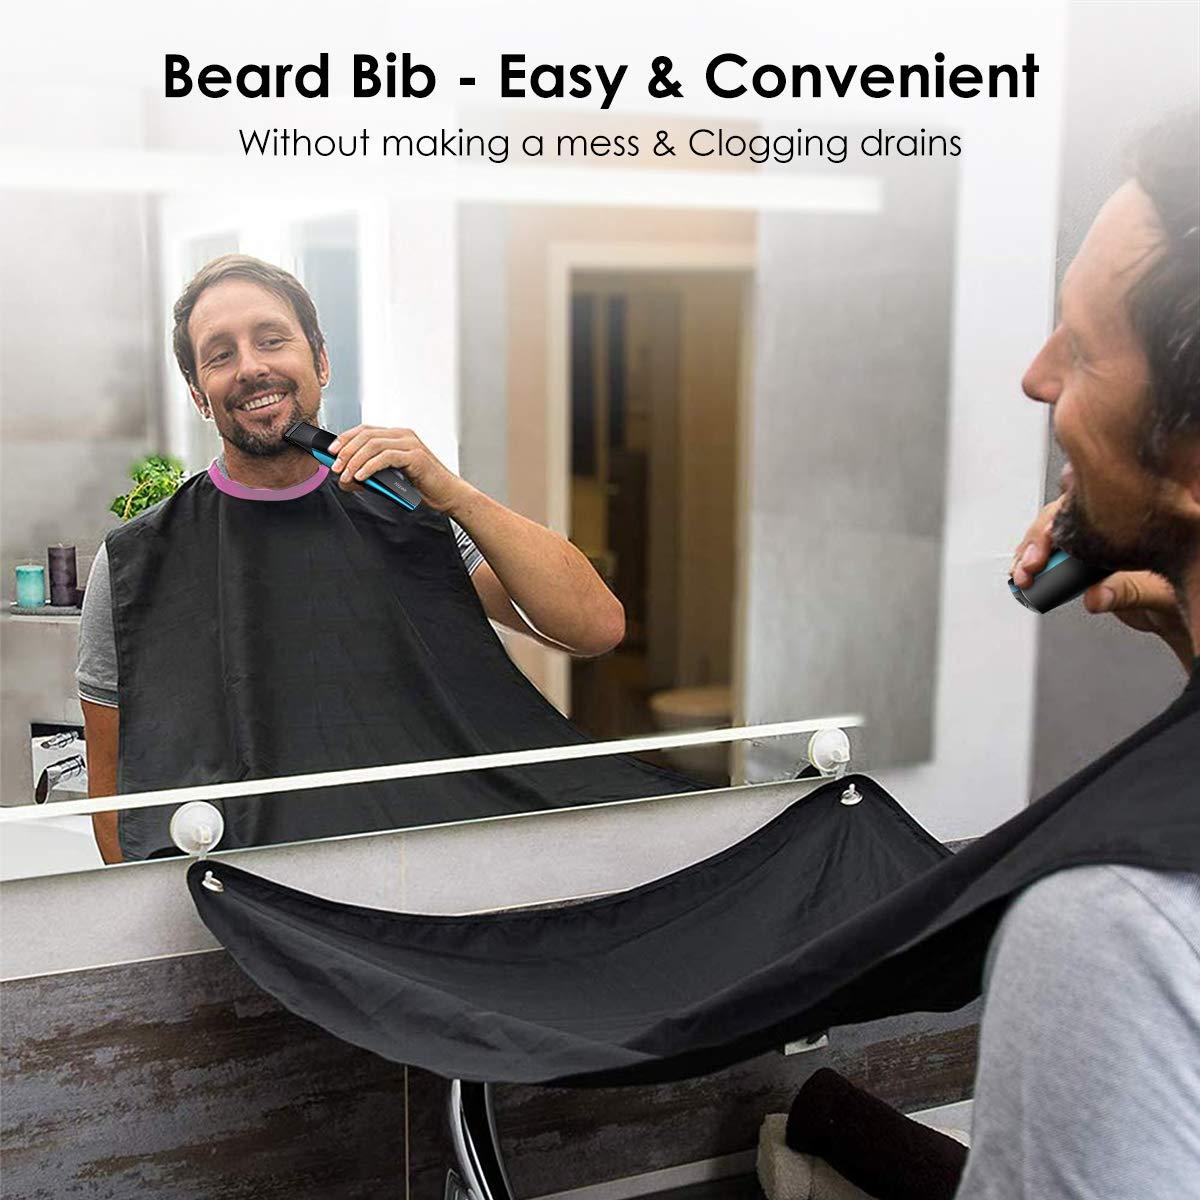 Beard Trimmer for Men, 11 In 1 Pro Hair Clippers Cordless Nose Hair Trimmer Kit